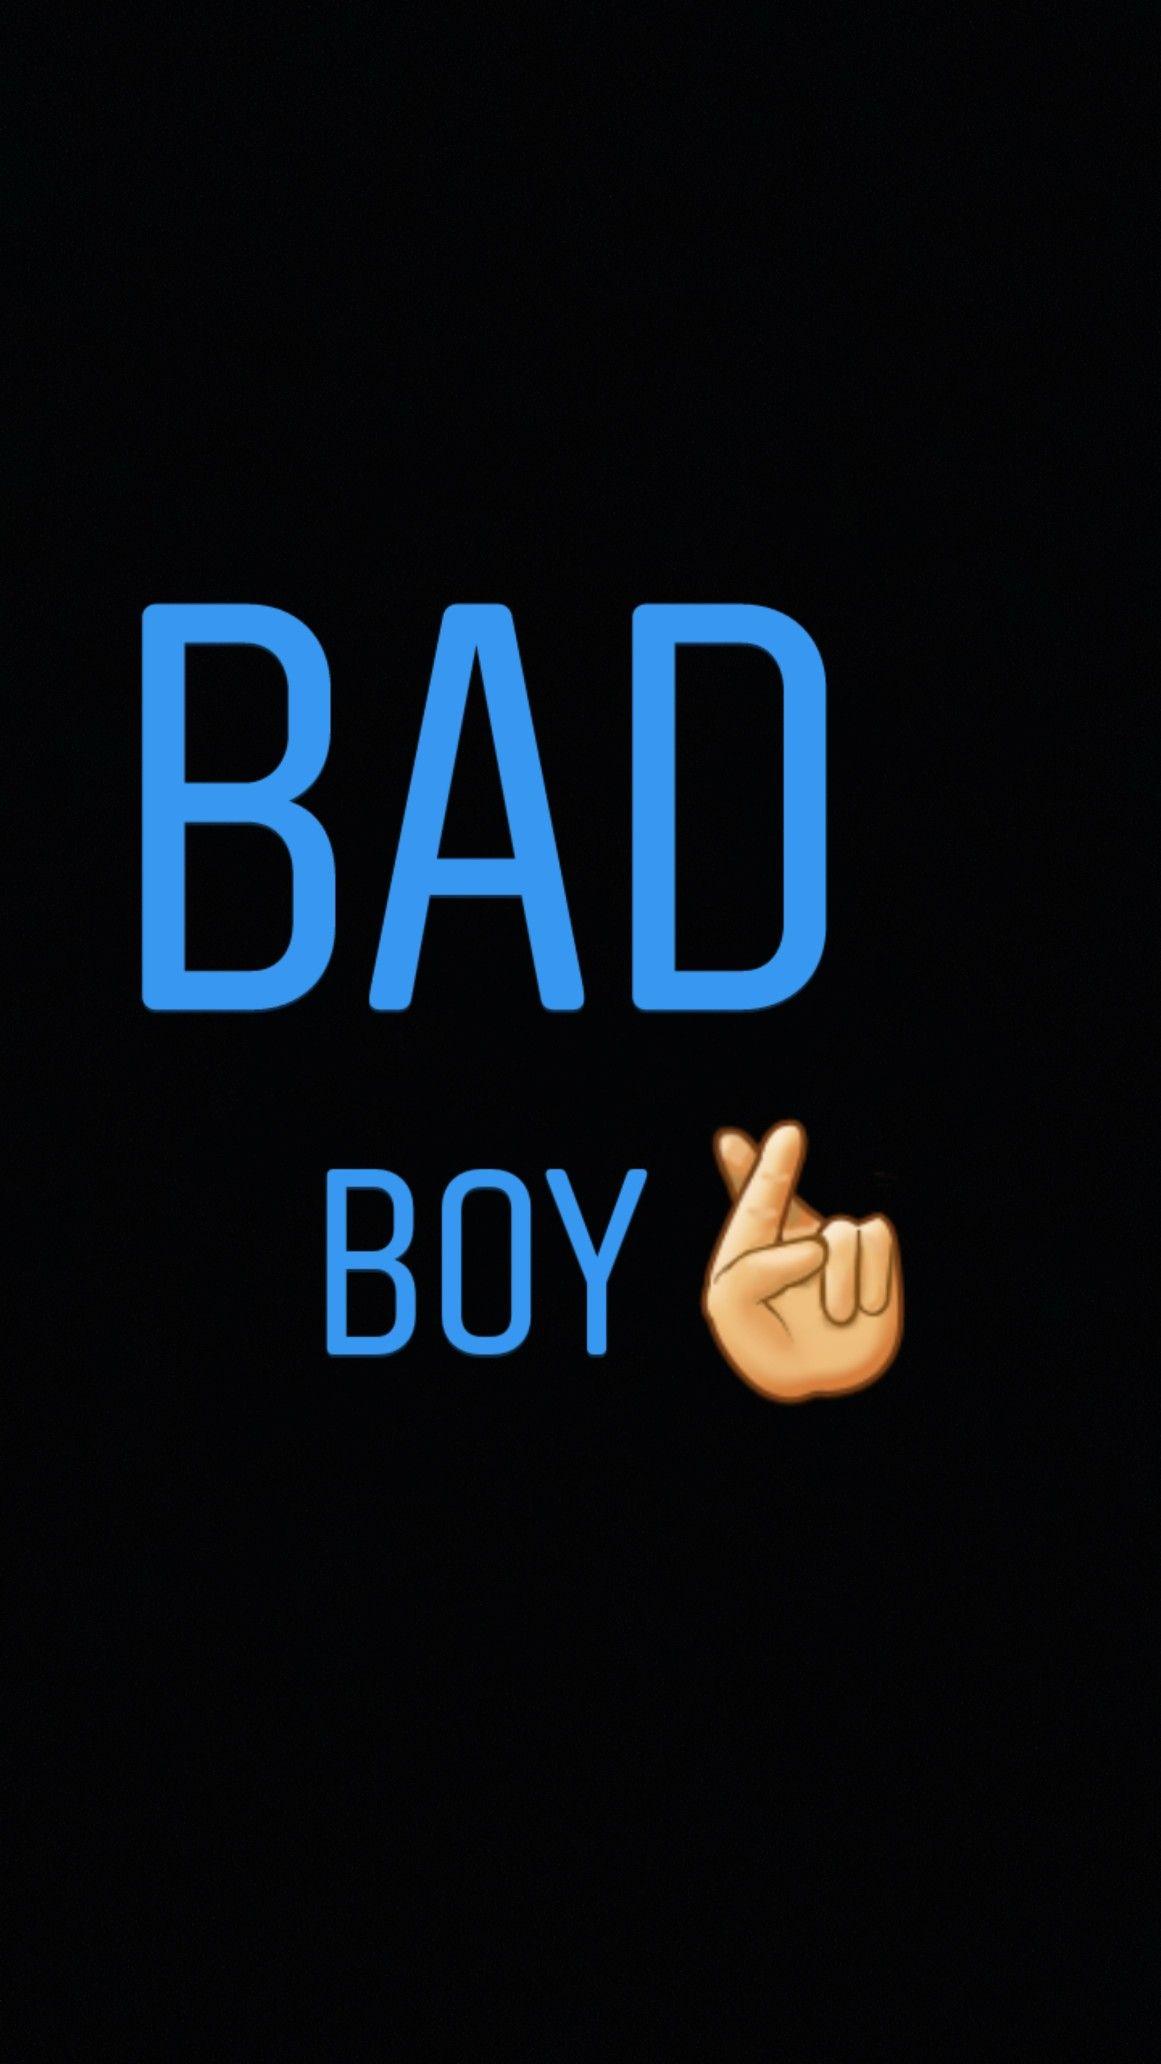 Boy pics hd bad Gravely, Toro